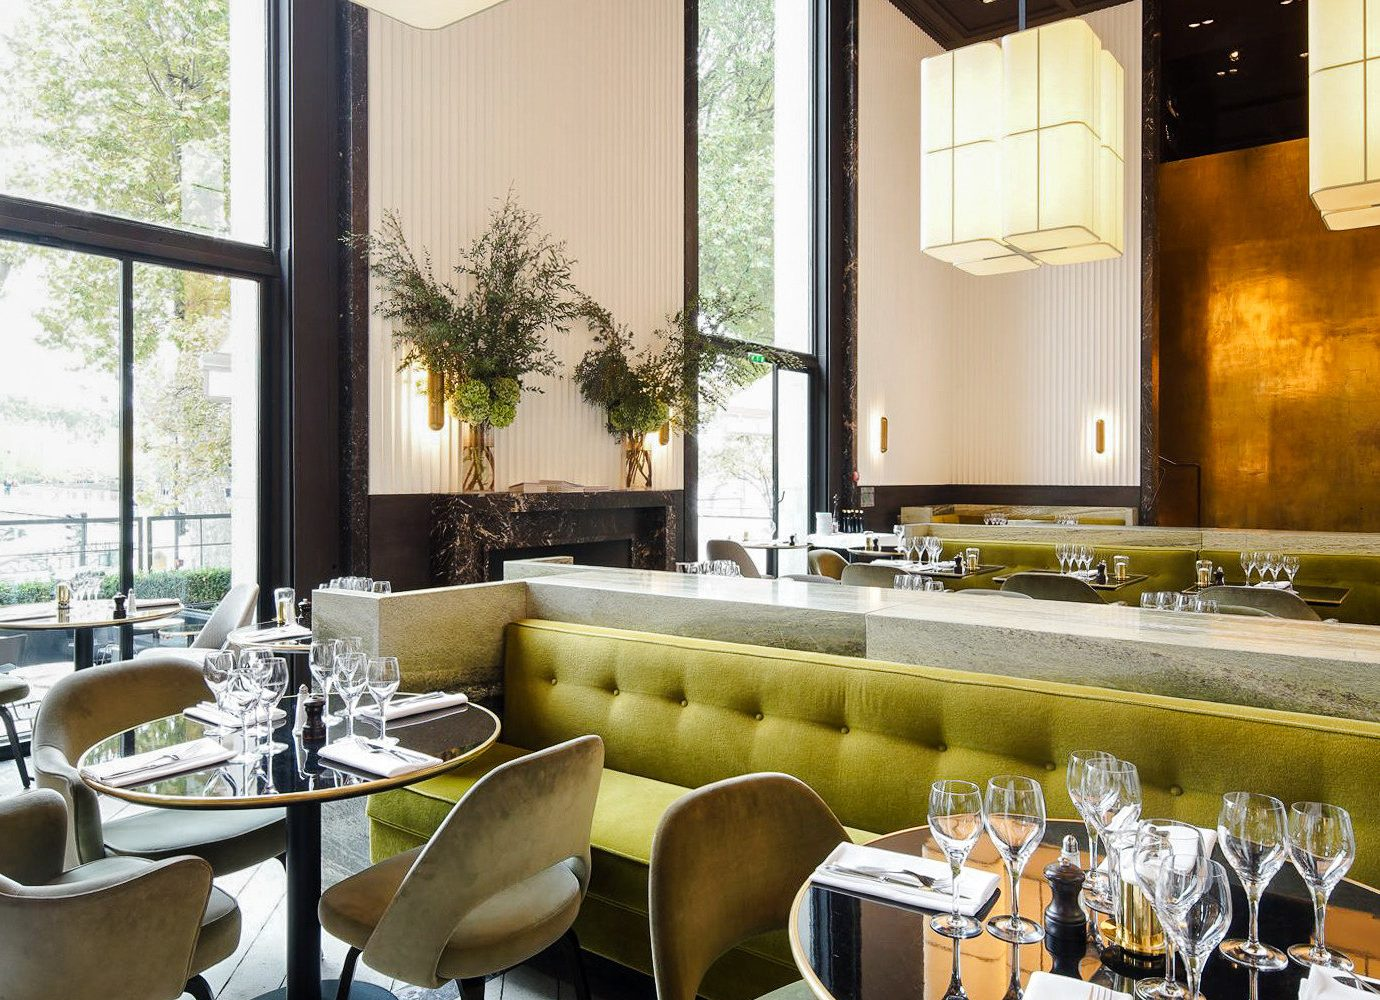 Food + Drink Romance window table indoor interior design restaurant real estate living room furniture